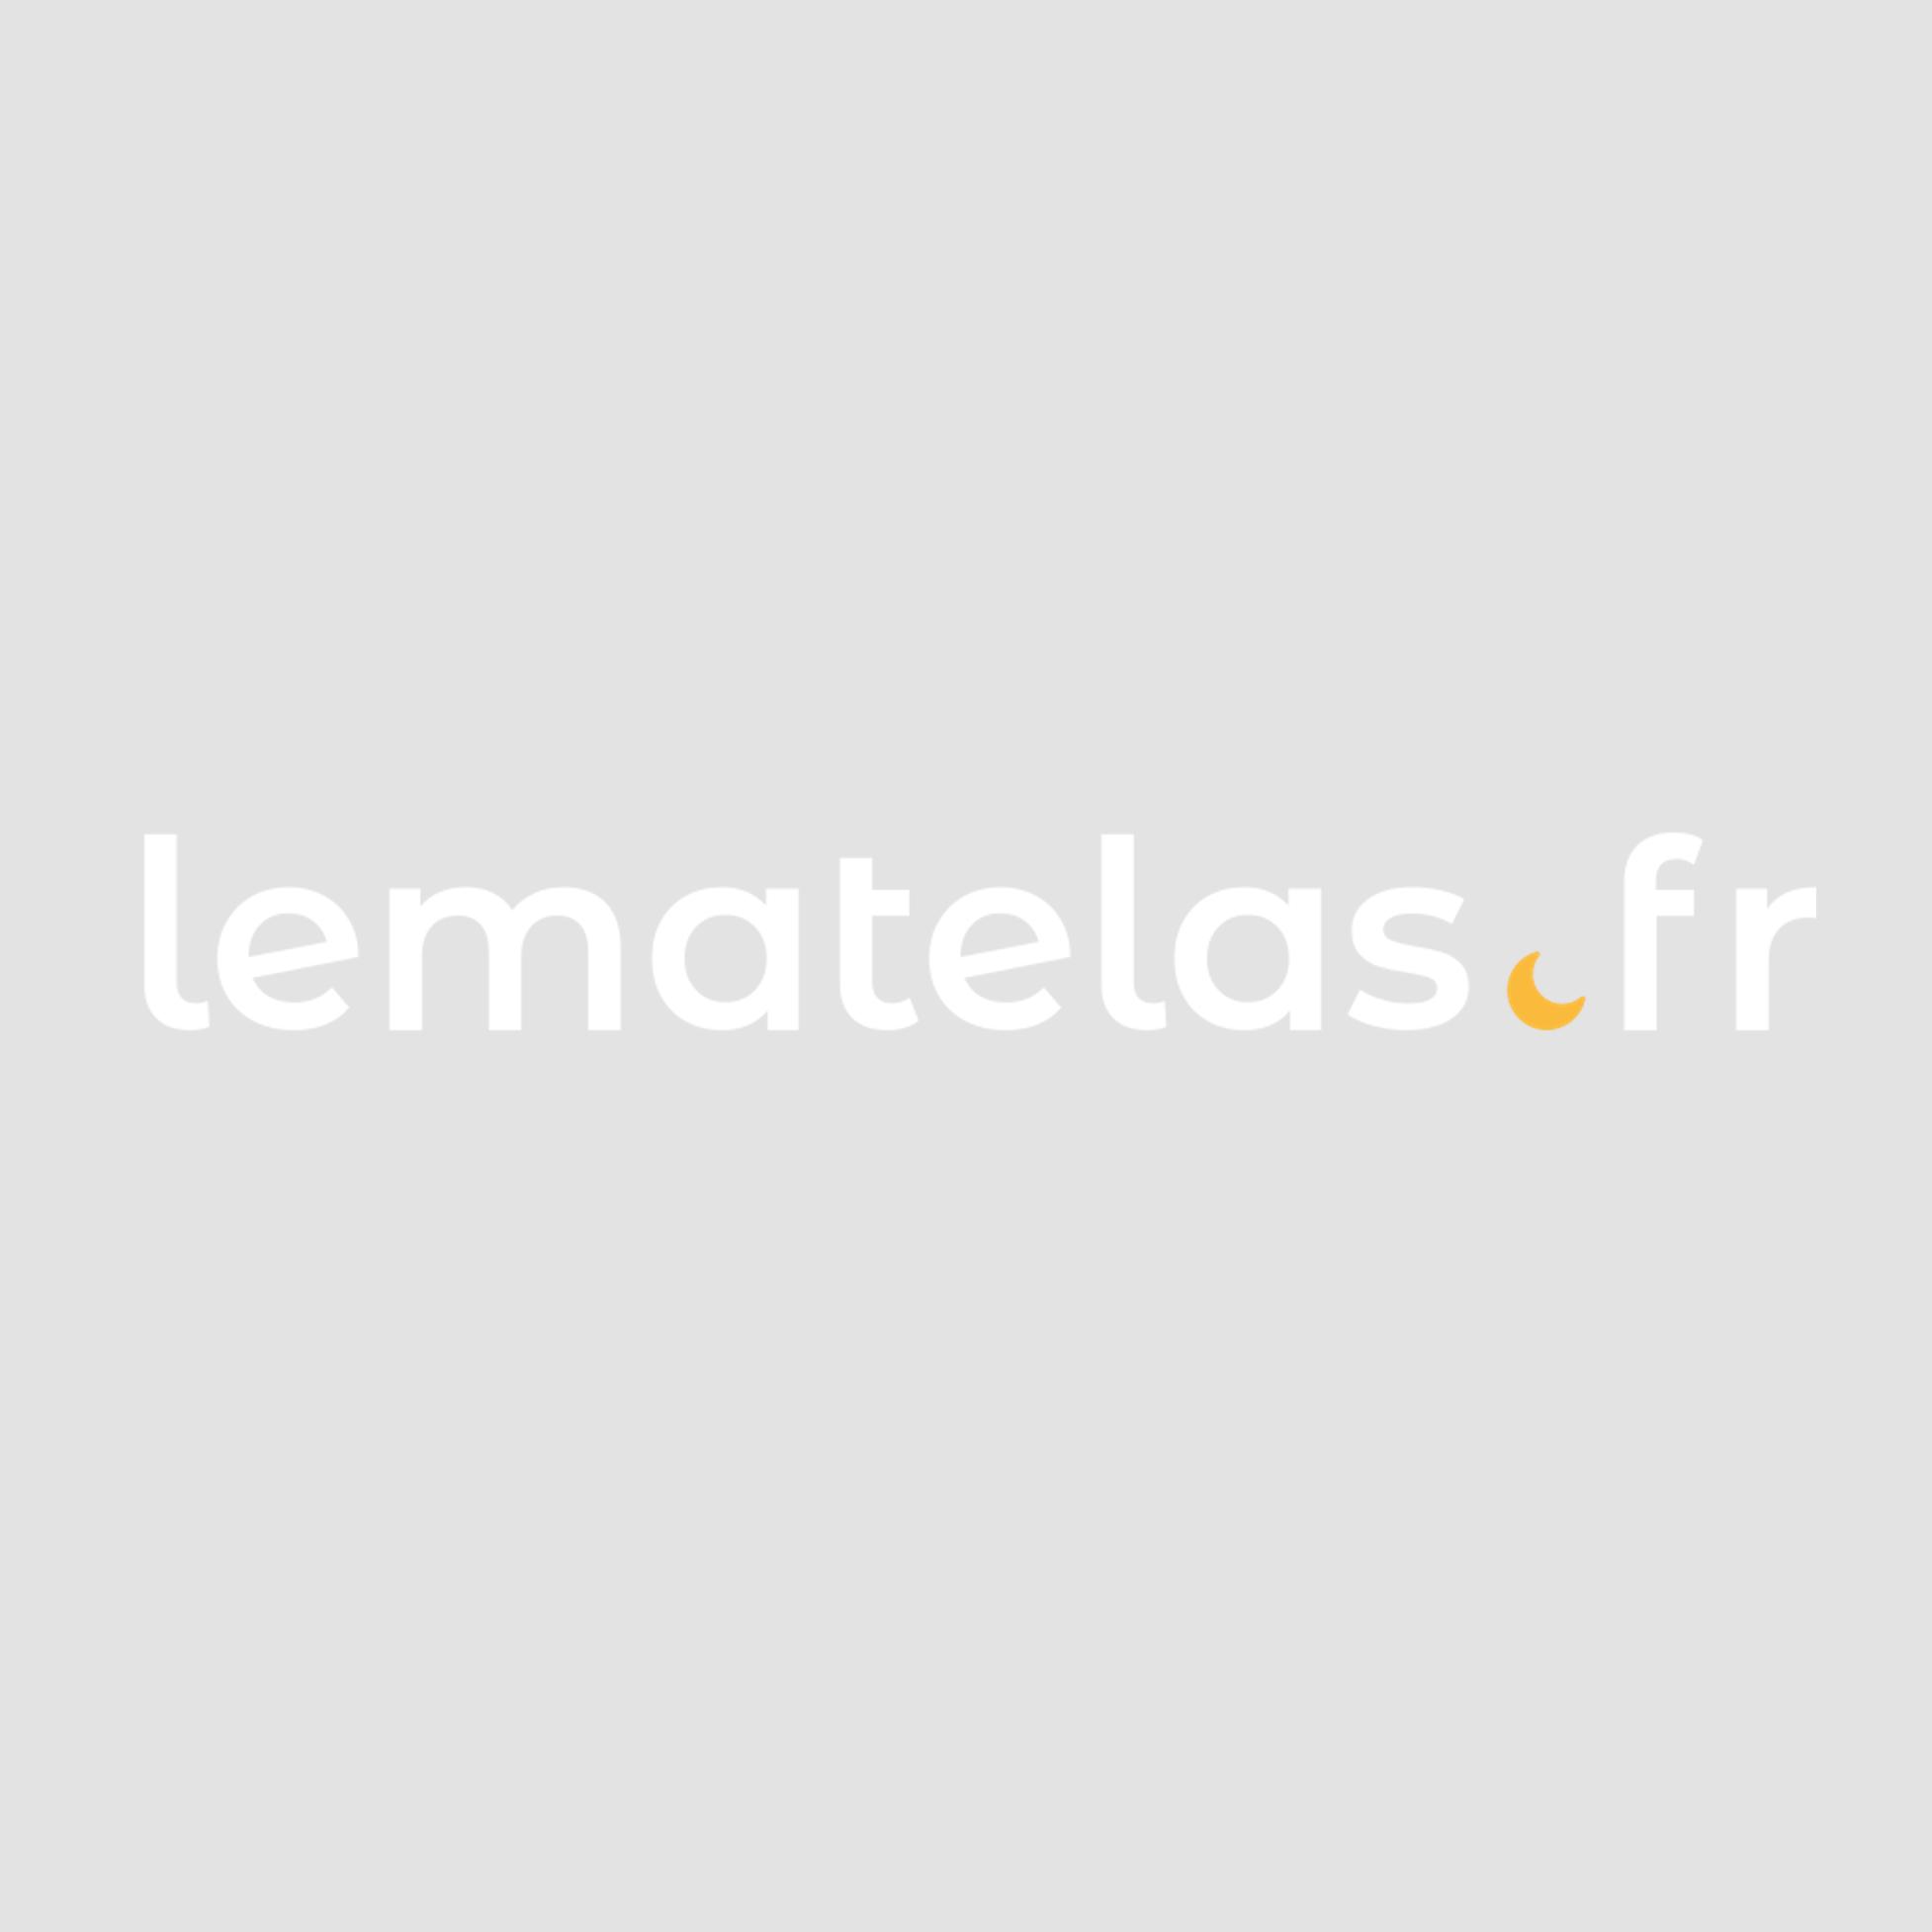 Cache-sommier rouge 100% coton 90x190 cm - Tradilinge